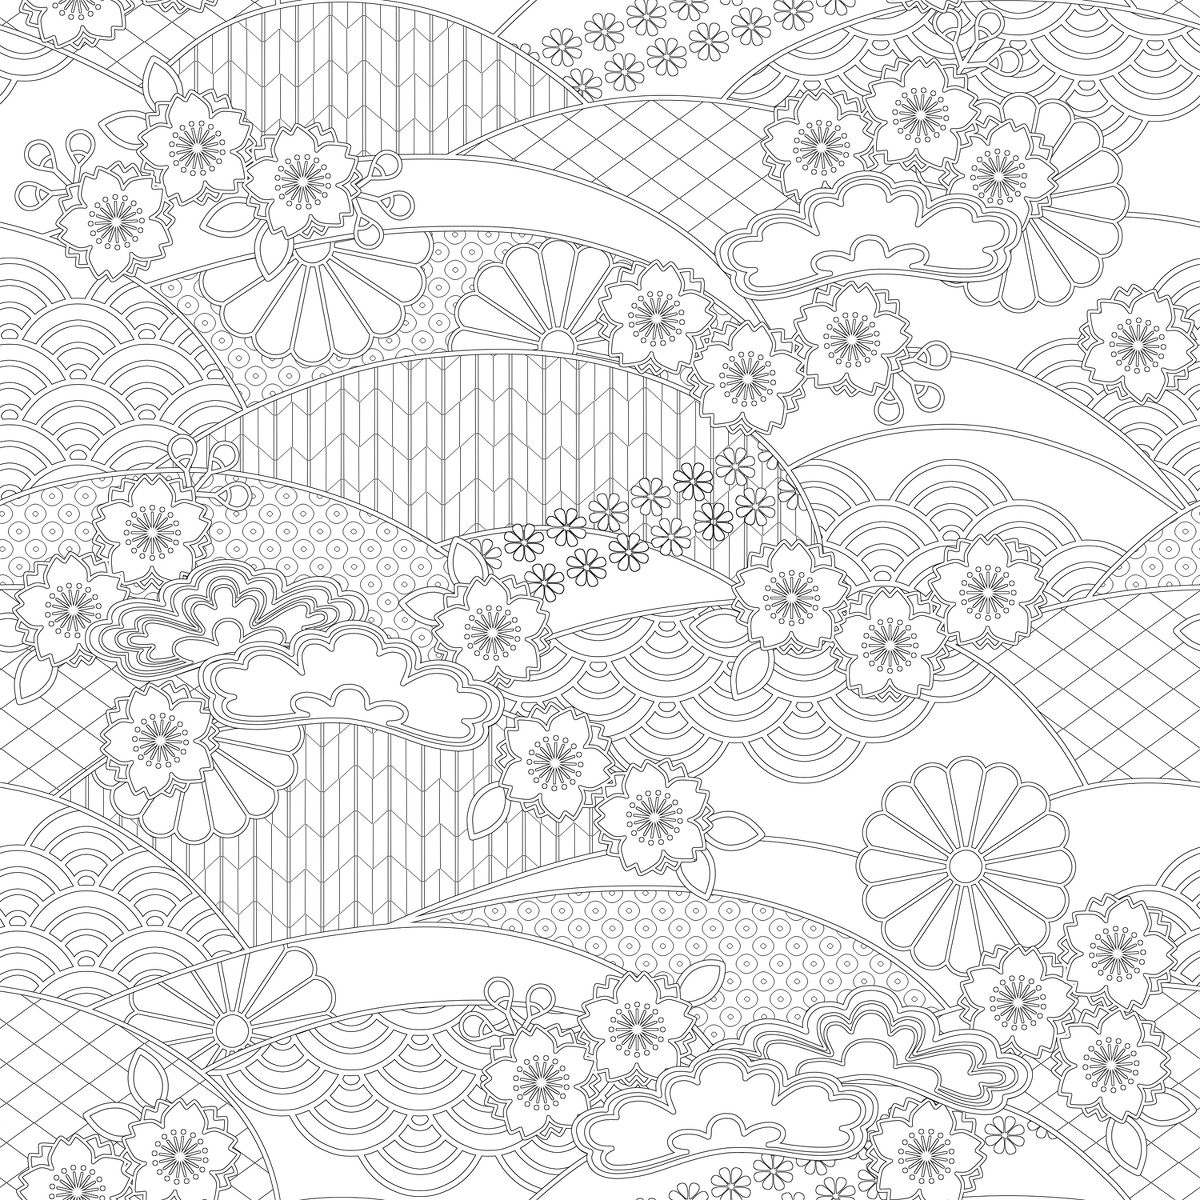 traditional Japanese pattern_to color_ http://www.pixiv.net/member_illust.php?mode=medium&illust_id=34278668